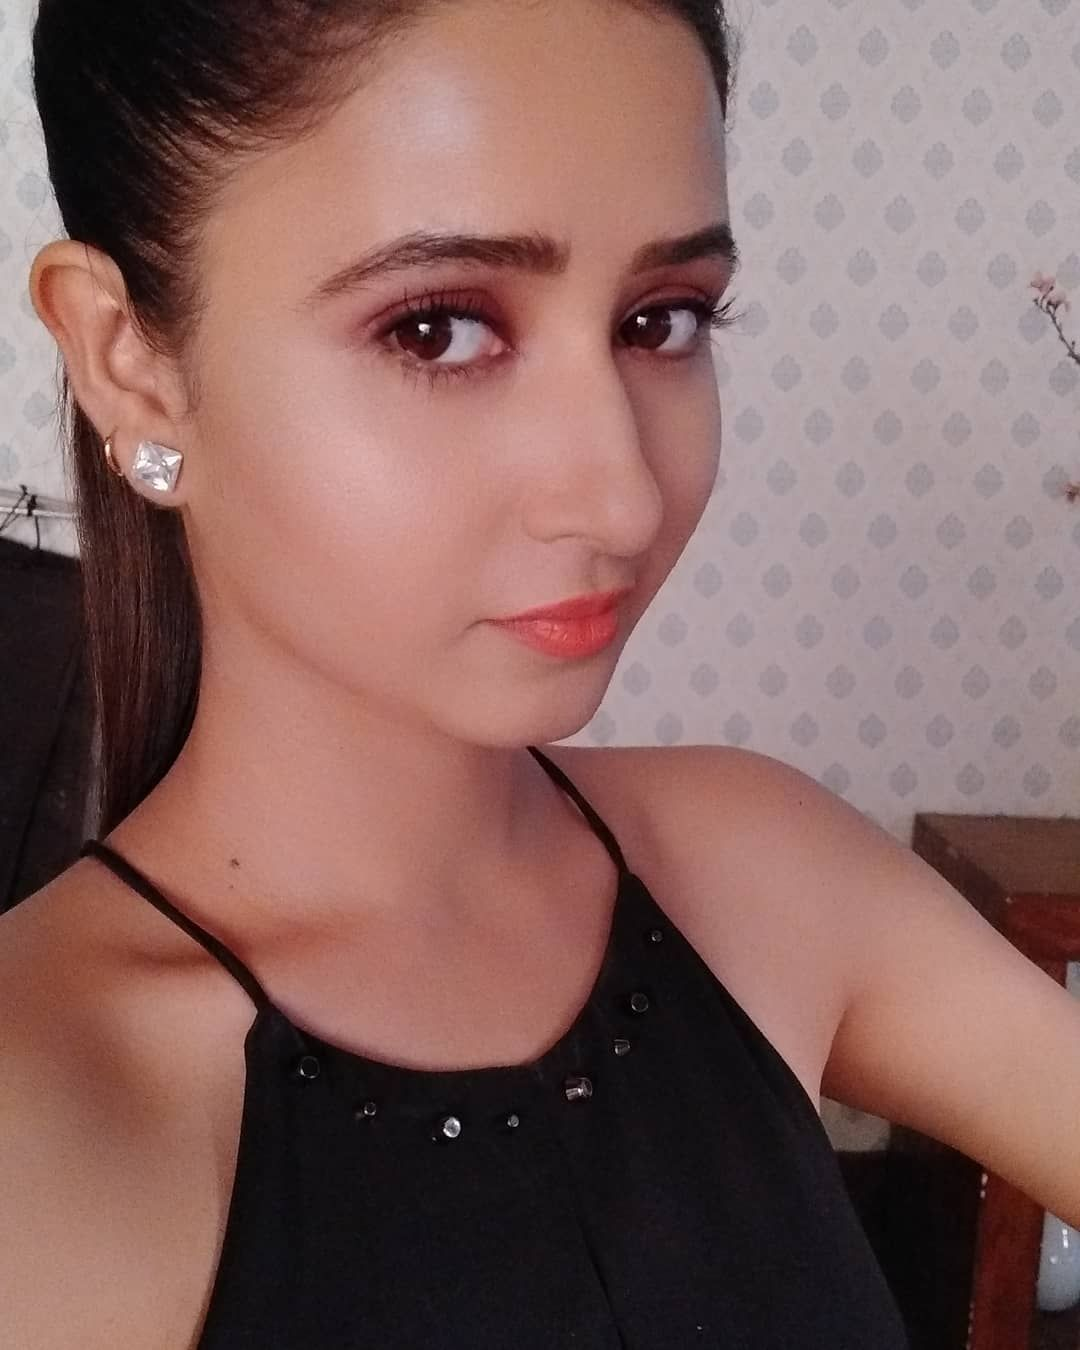 Sana Amin Sheikh 1995 naked (44 photo), Tits, Fappening, Selfie, butt 2017